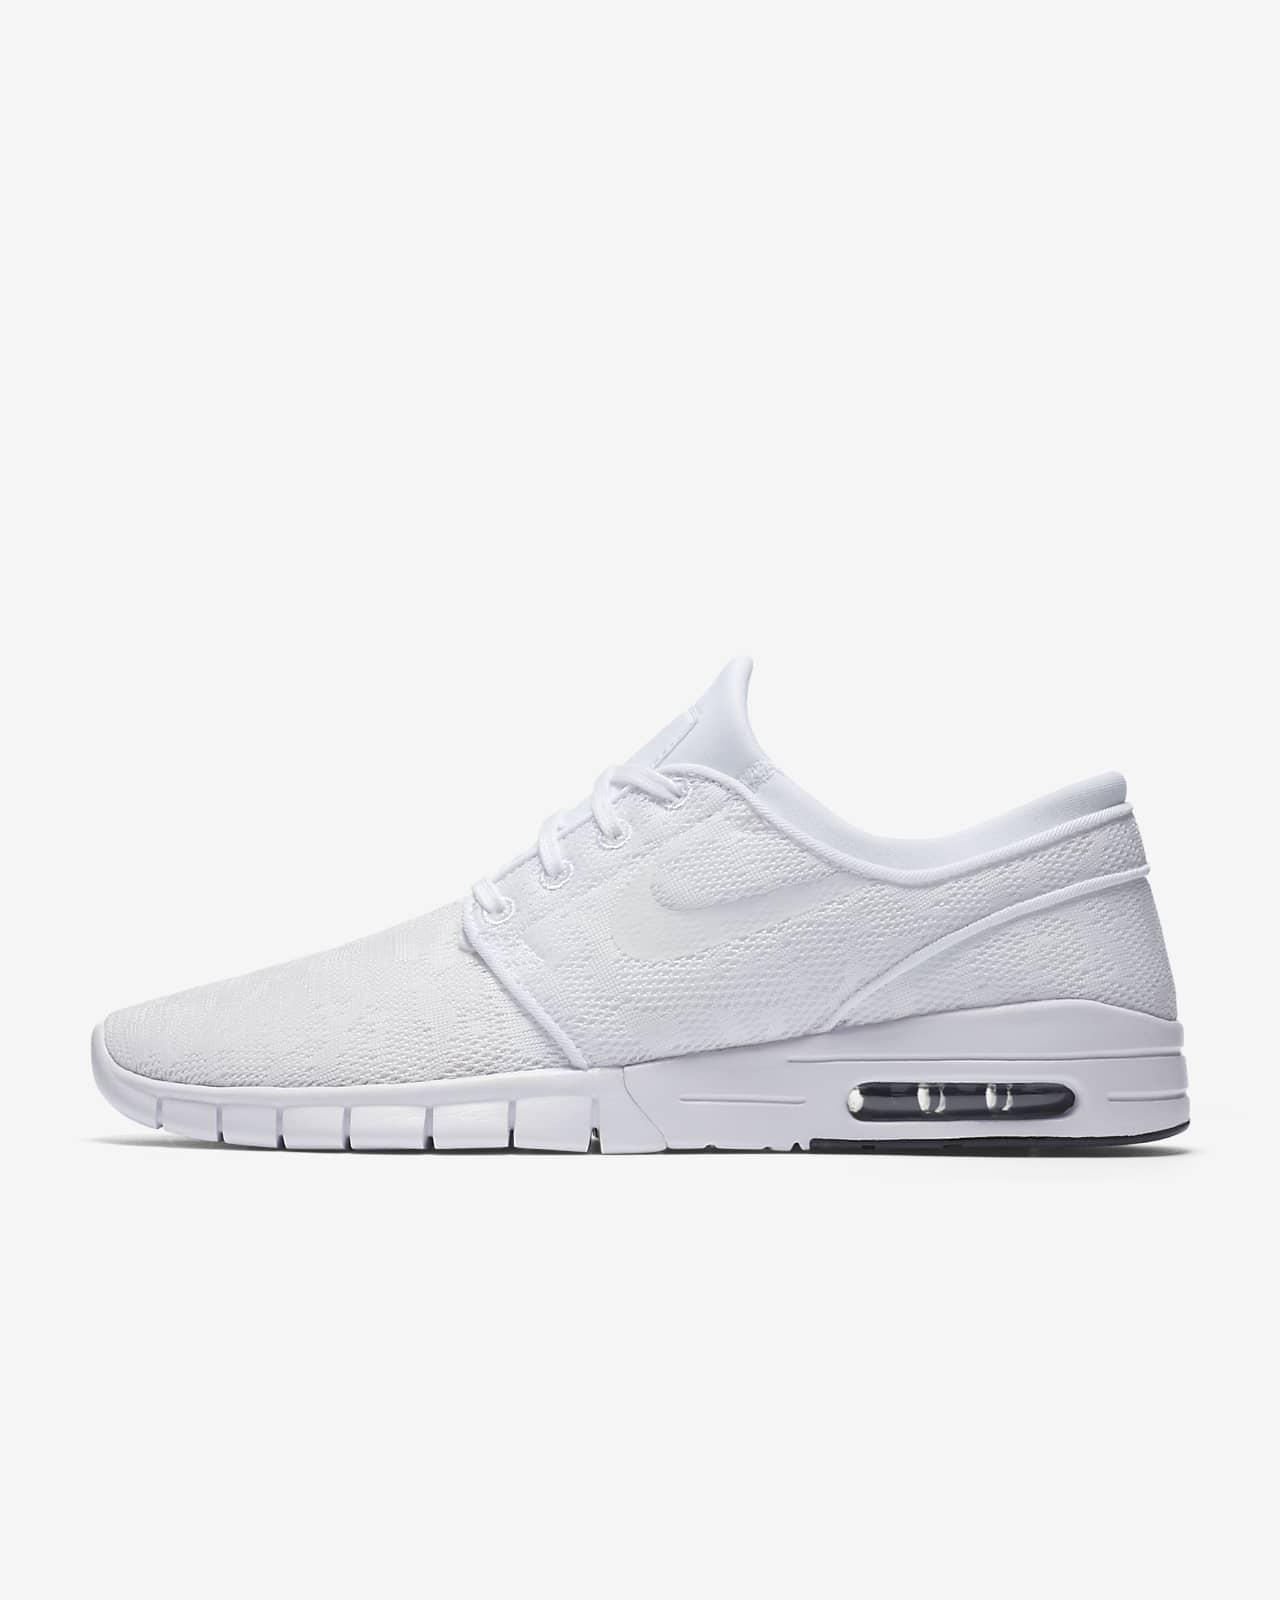 Chaussure de skateboard Nike SB Stefan Janoski Max. Nike FR